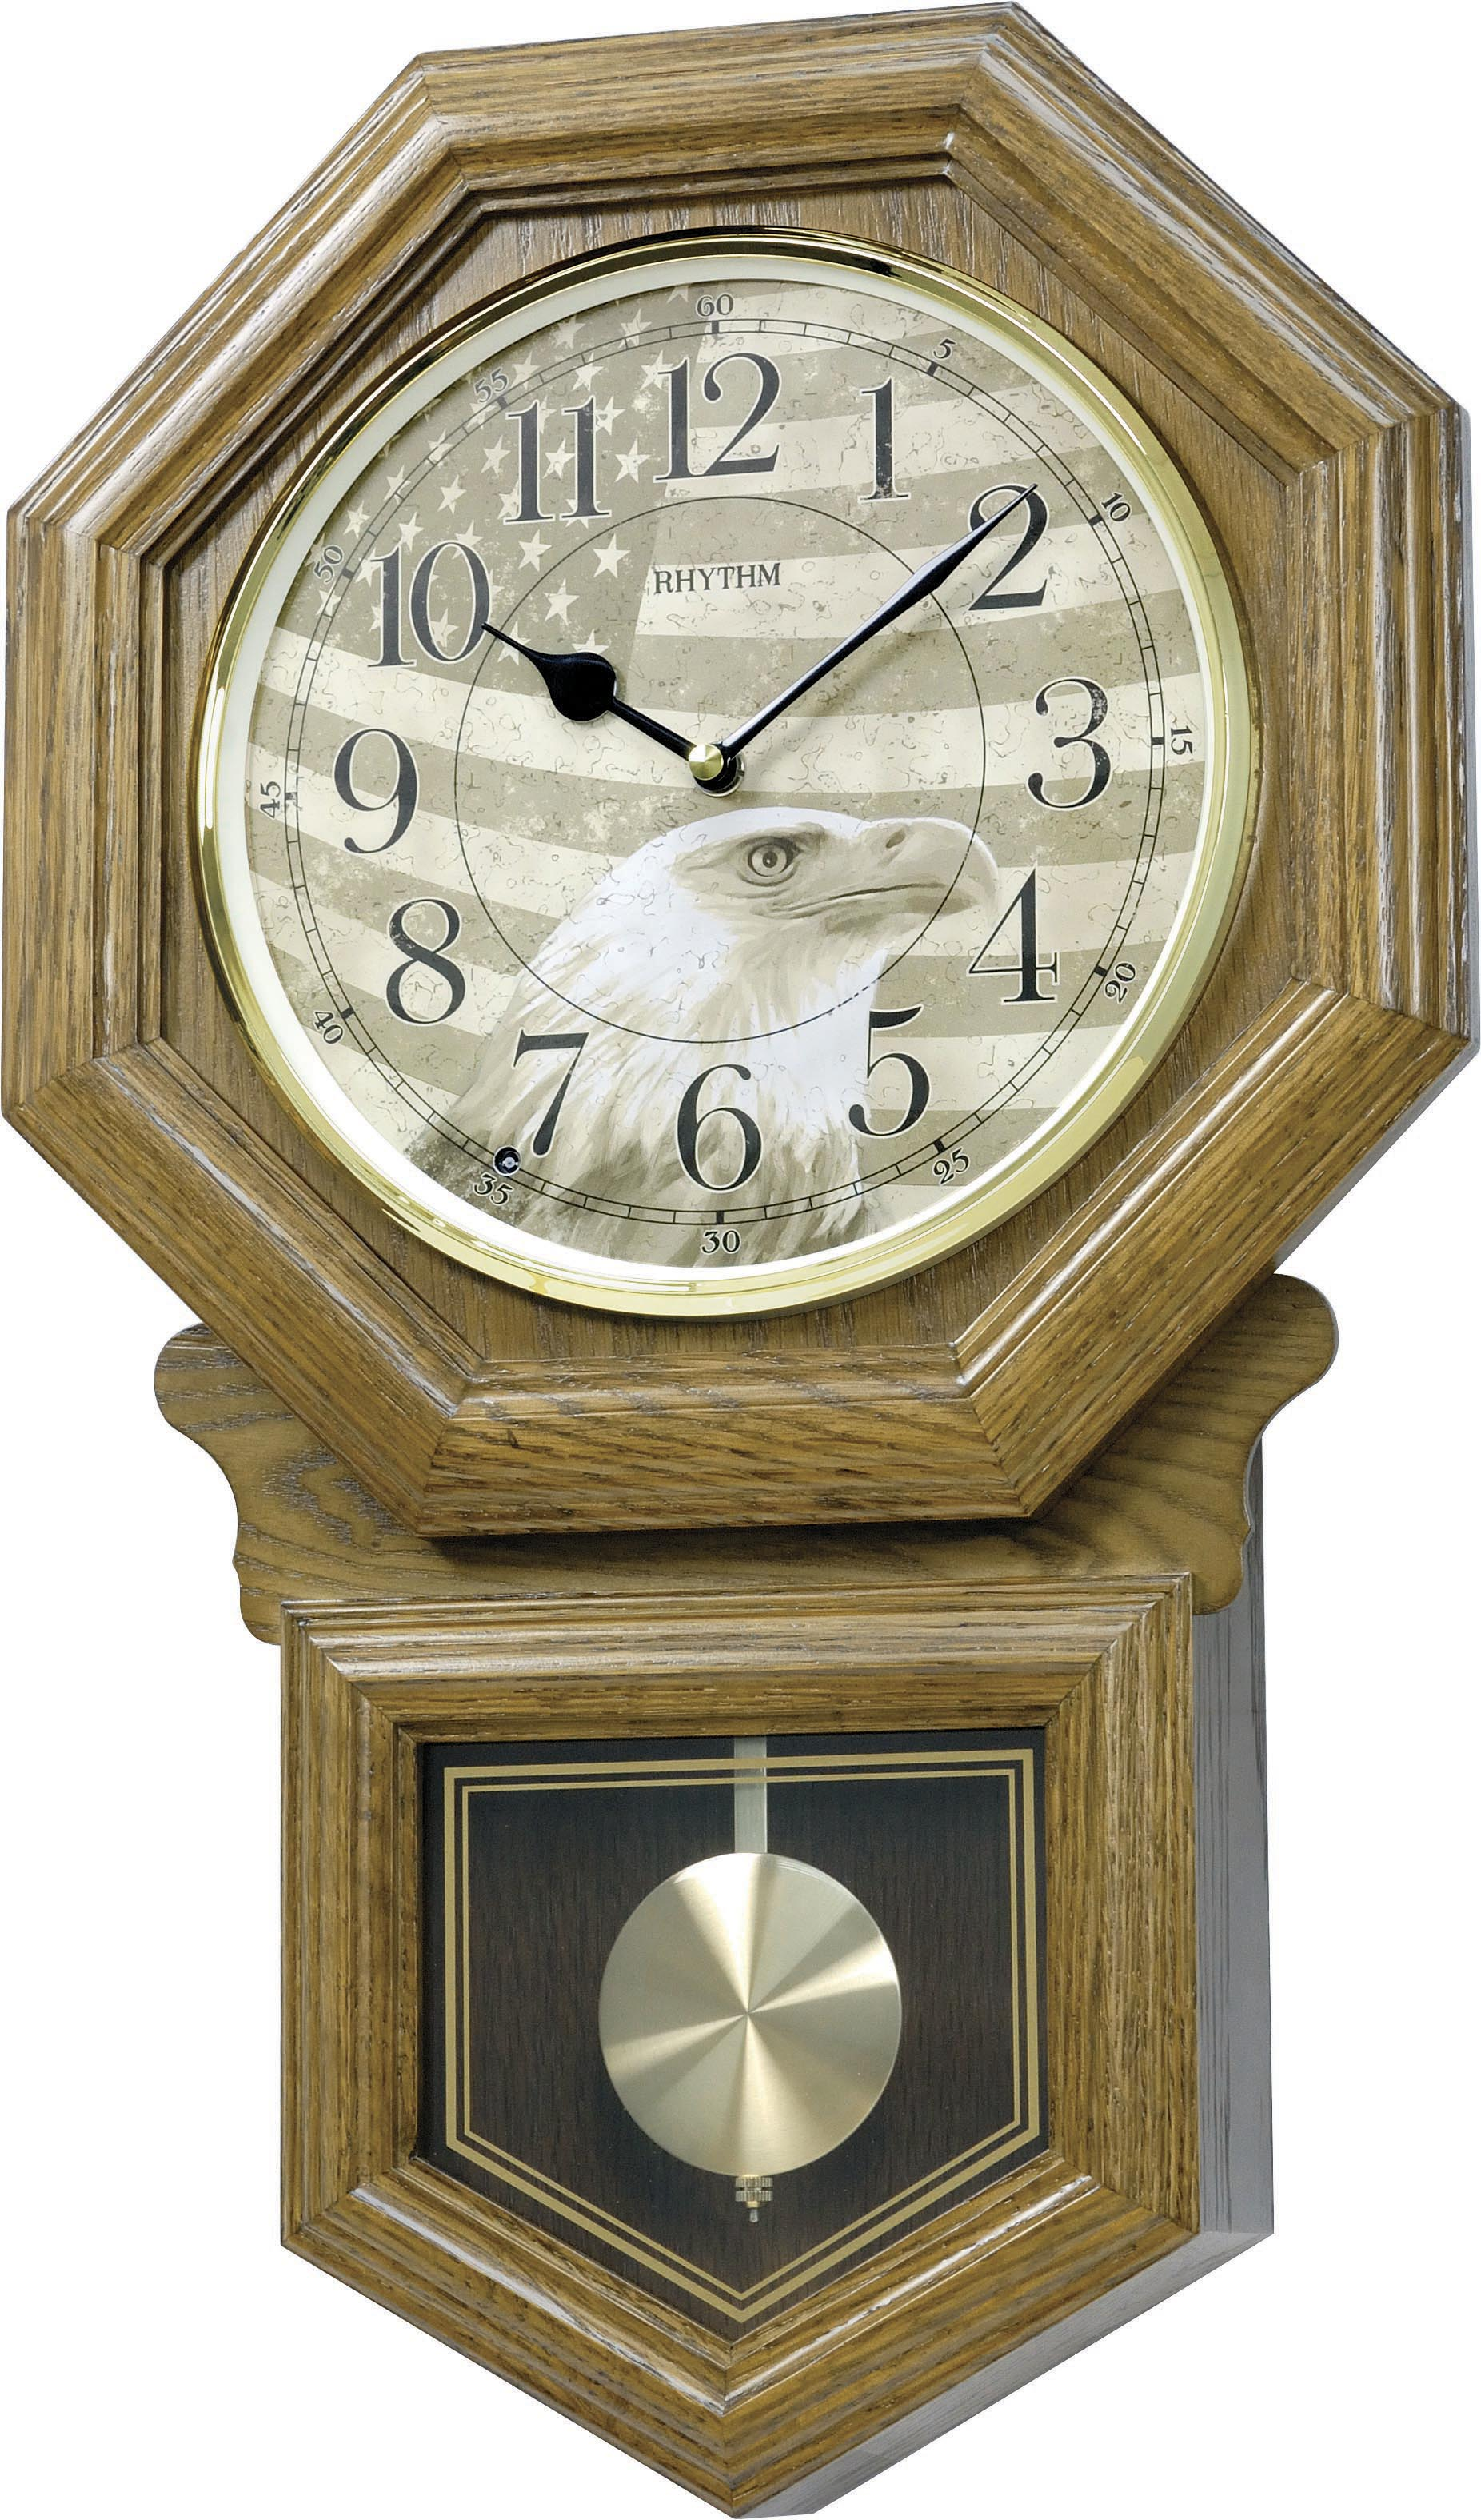 American Patriot Rhythm Clocks